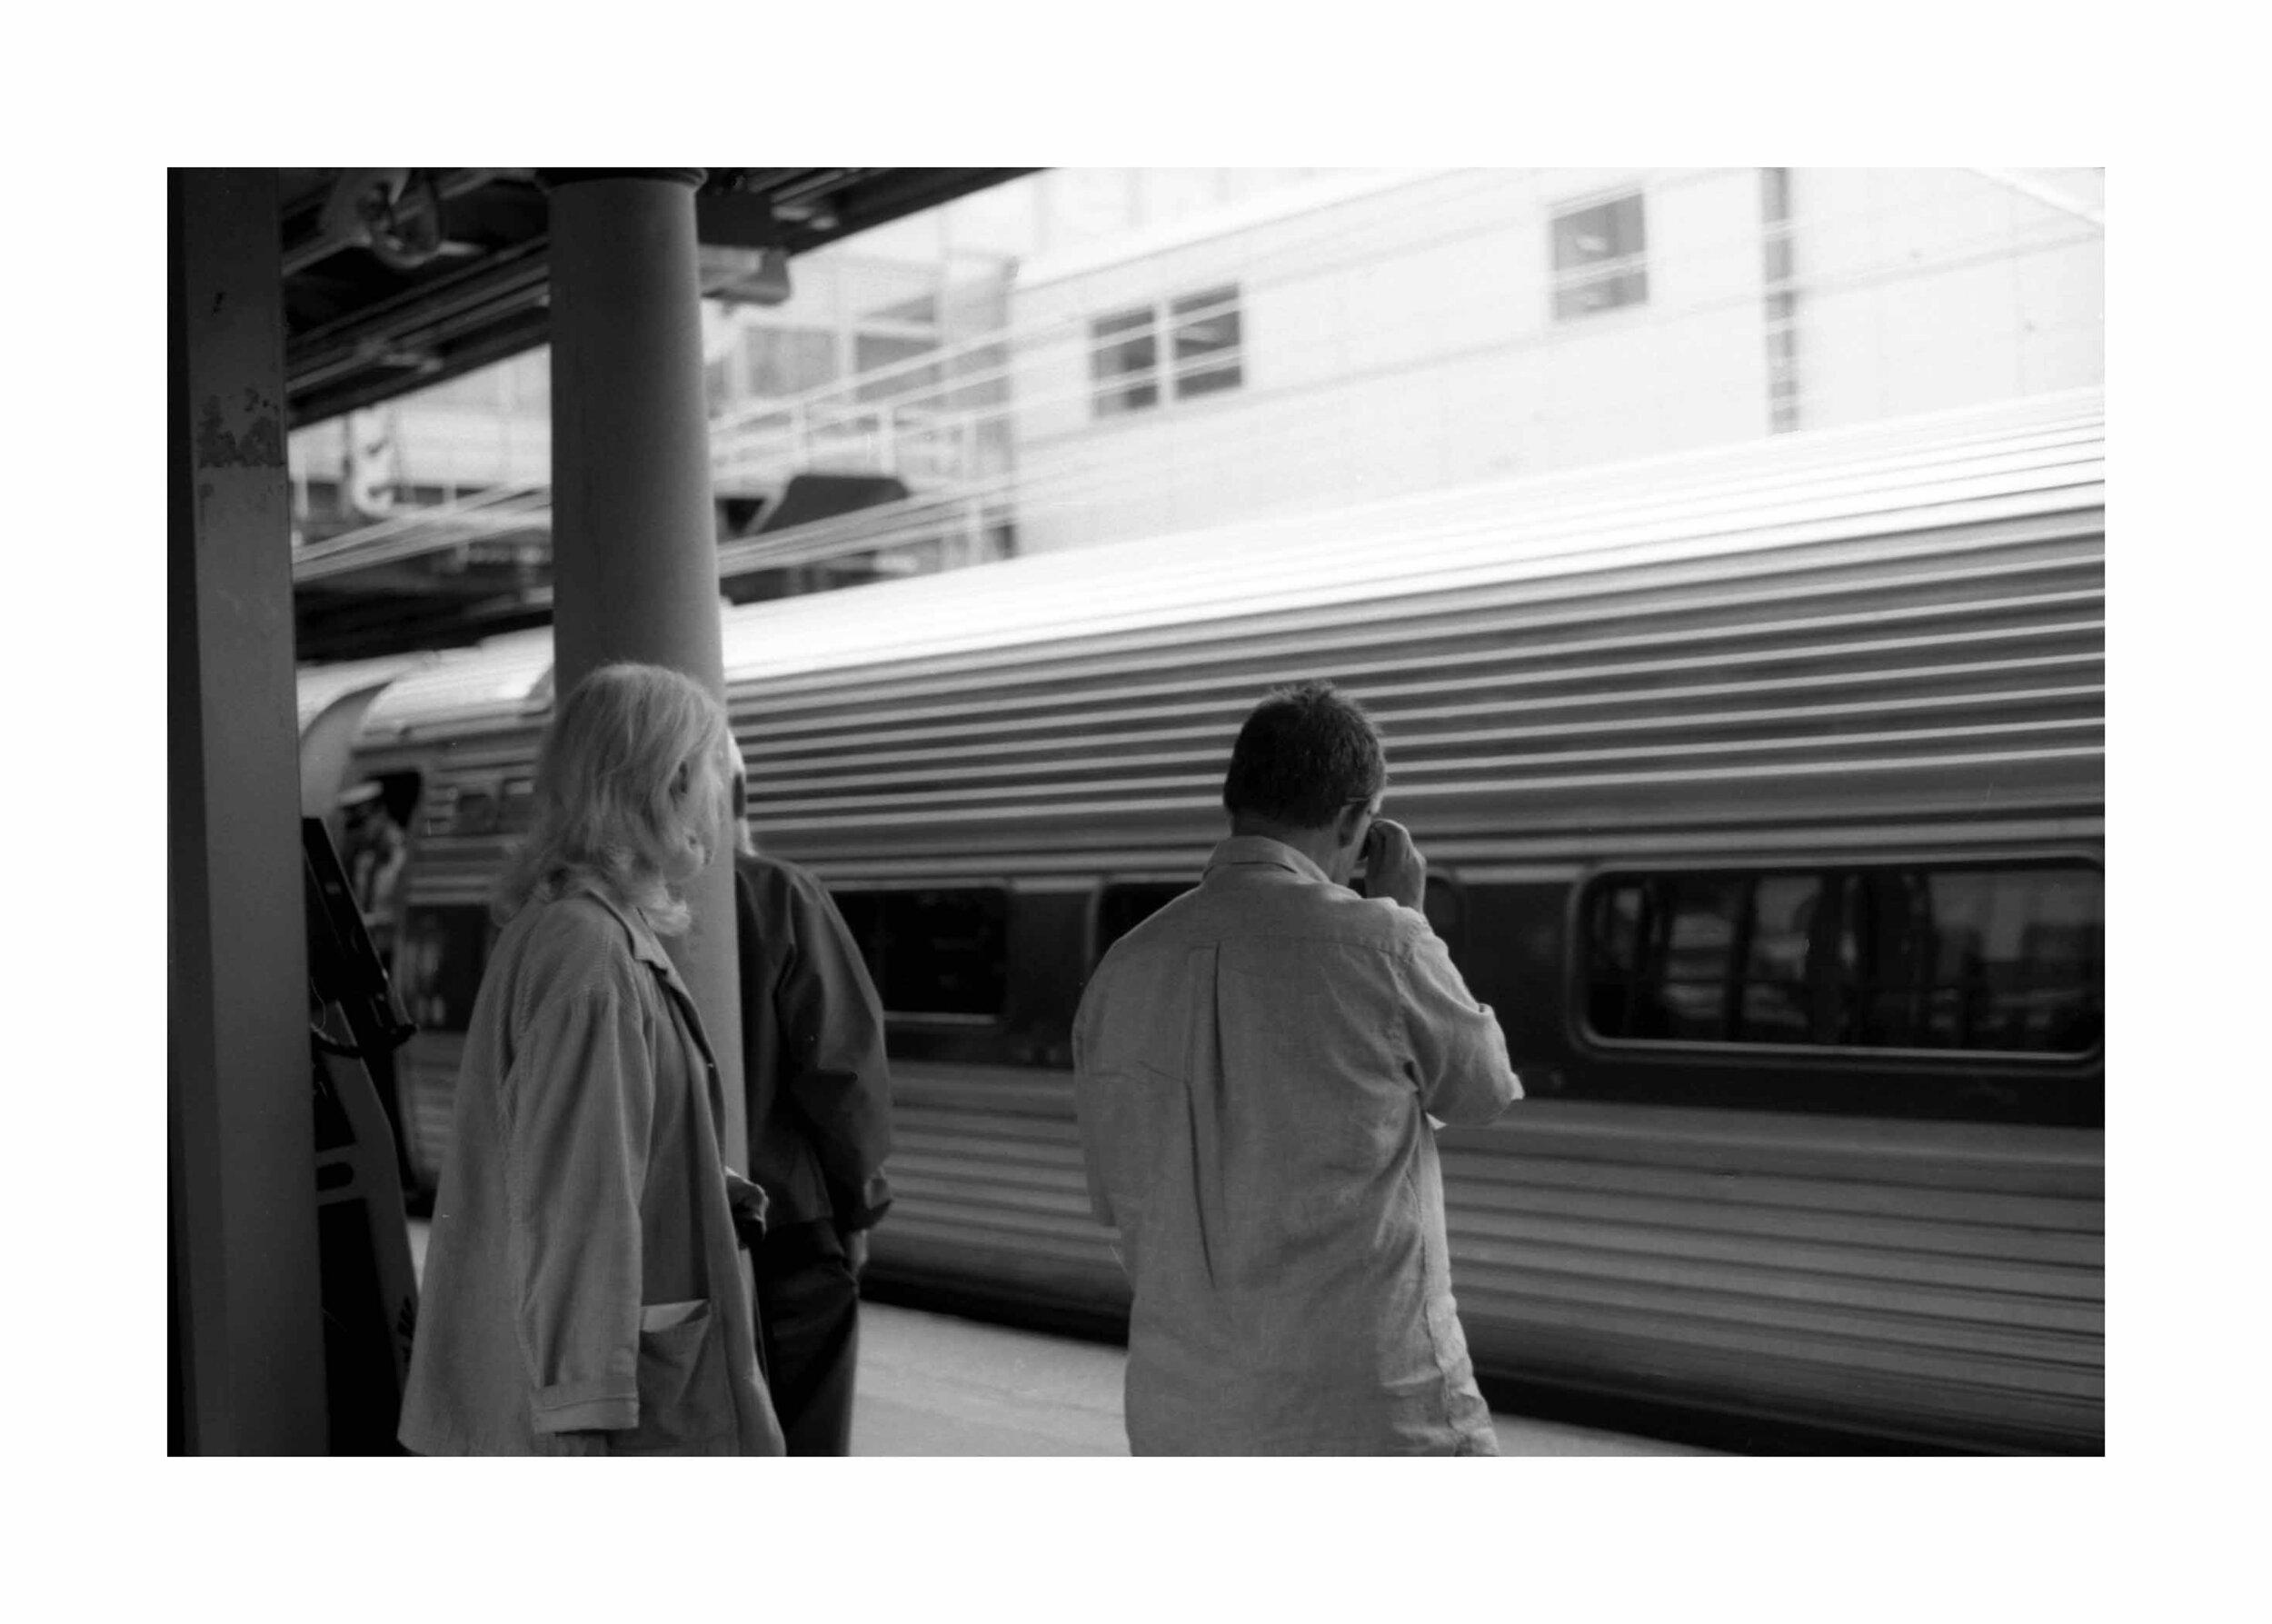 train251edit.jpg